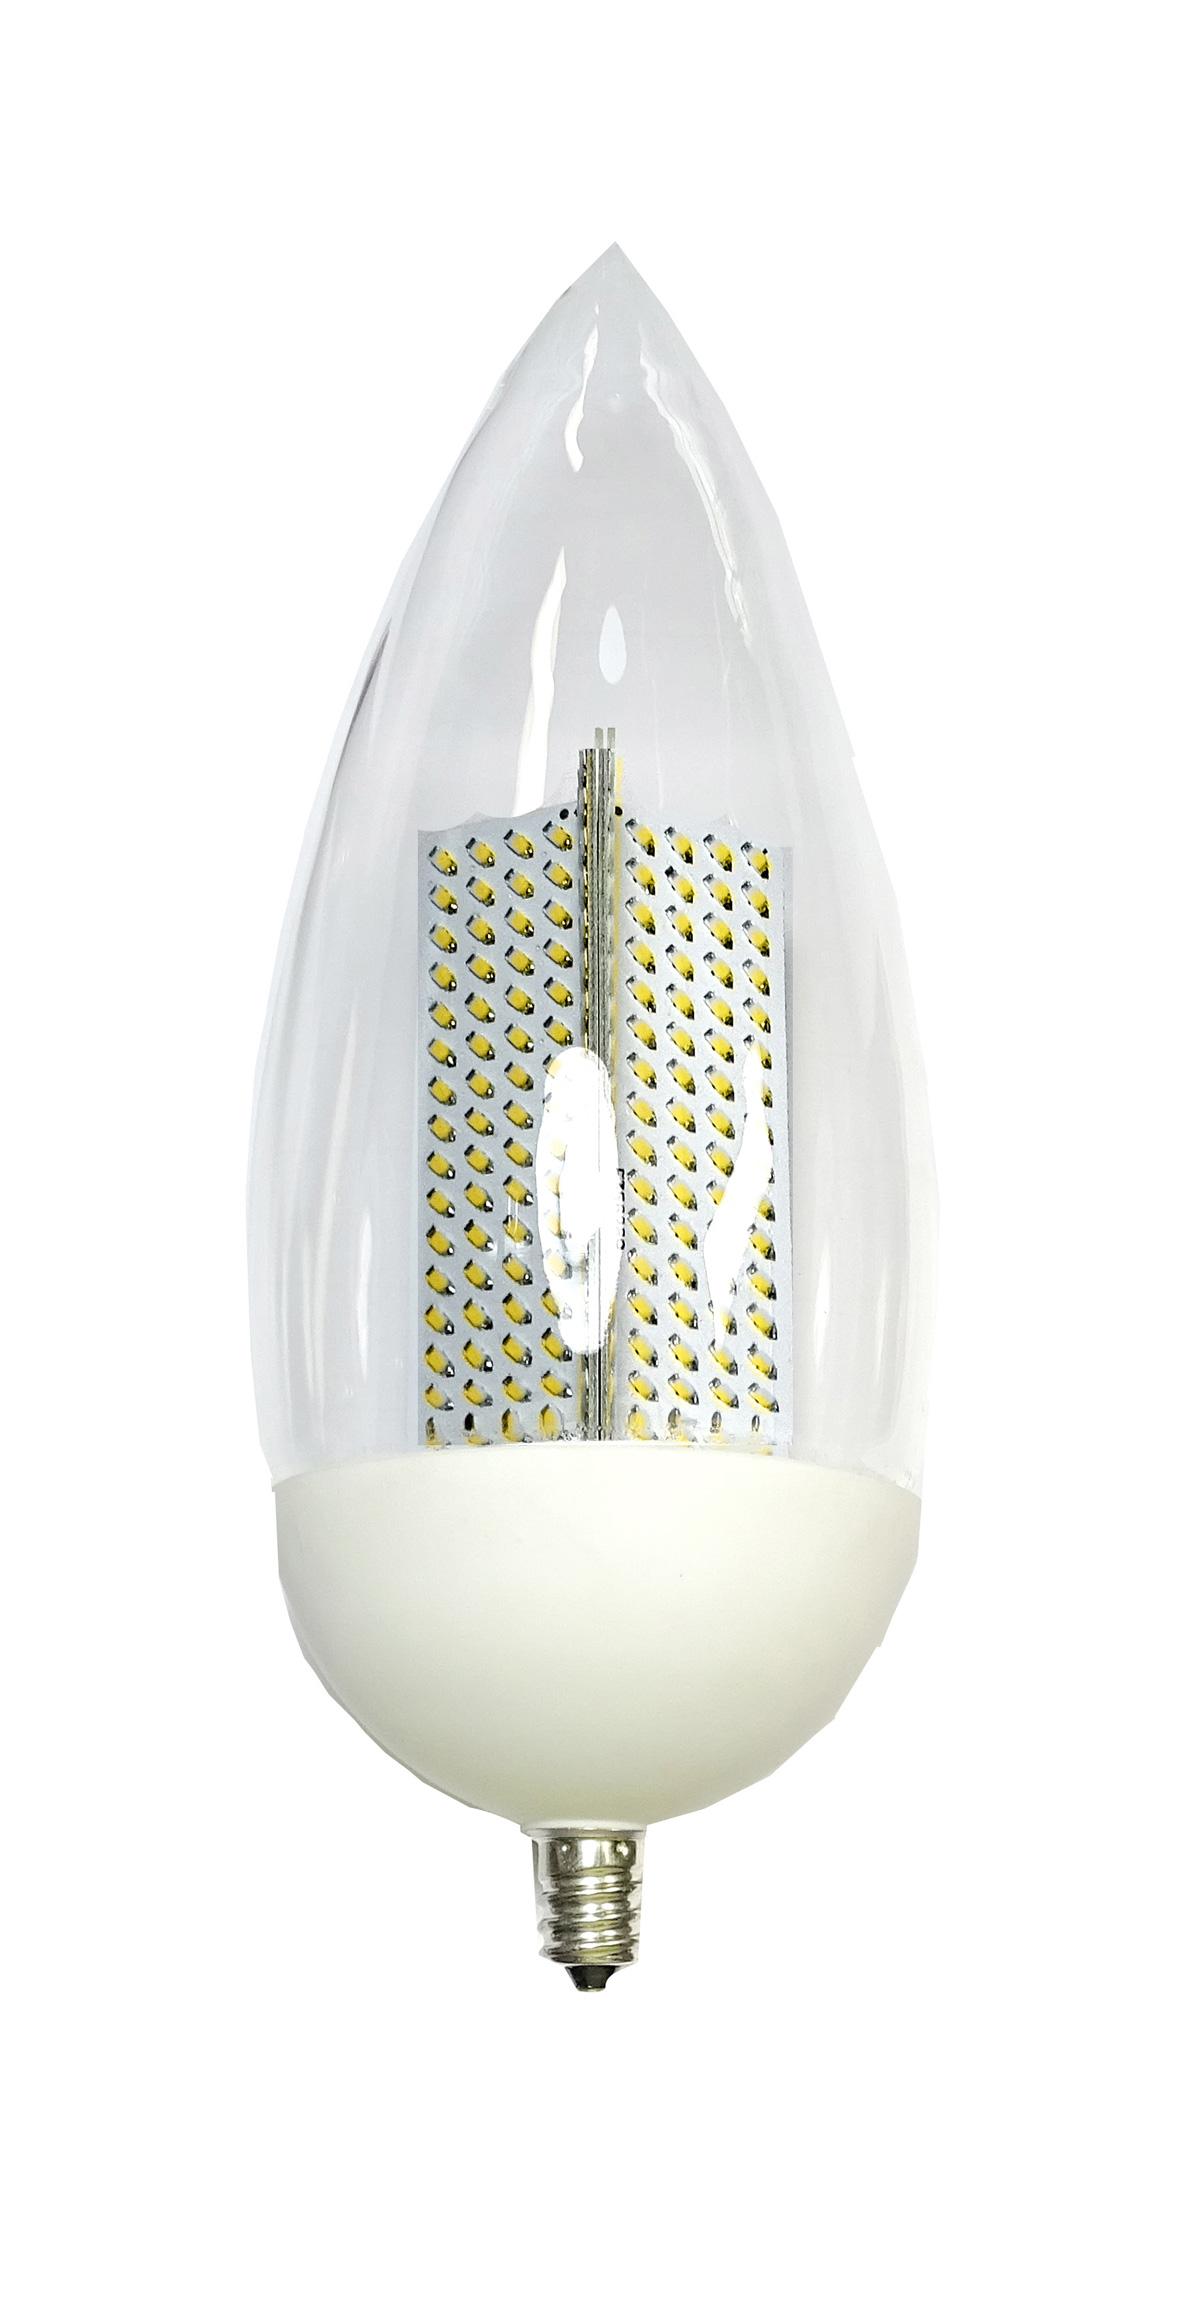 Flame Effect Led Light Bulb